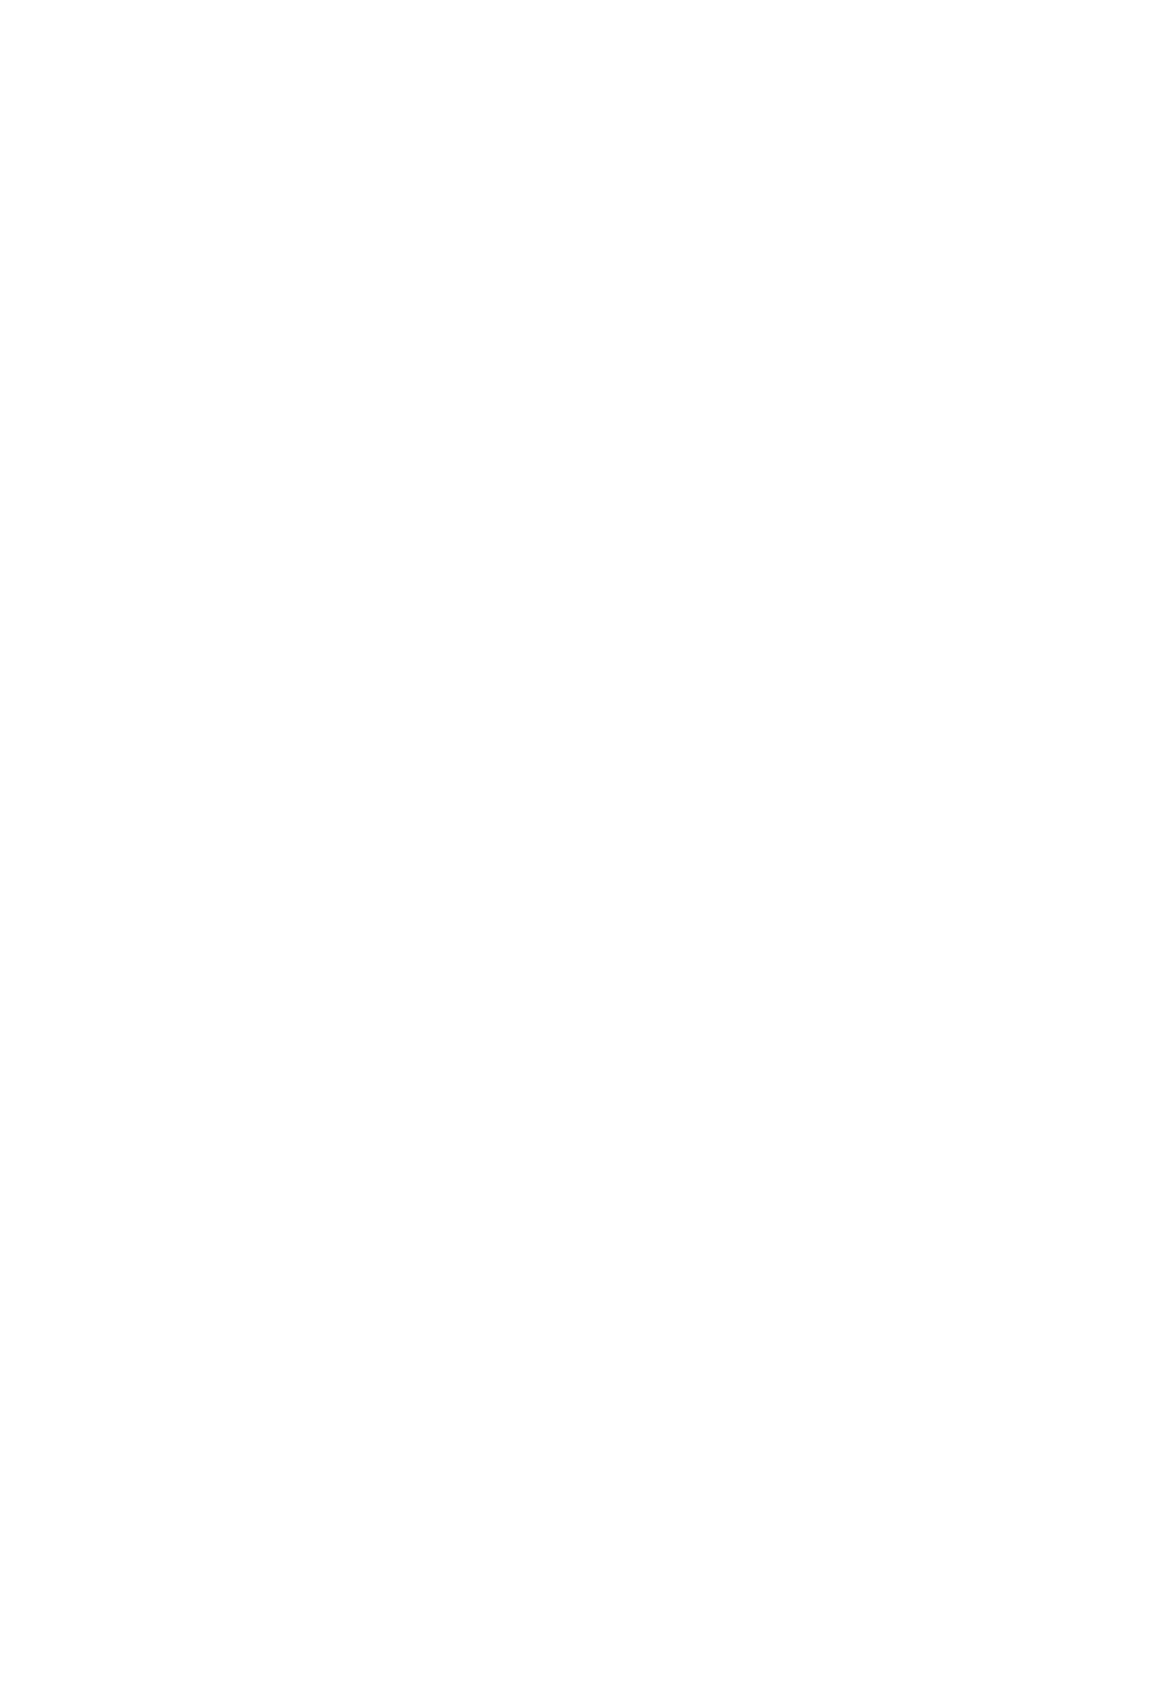 Press kit gcp applied. News clipart newspaper vendor